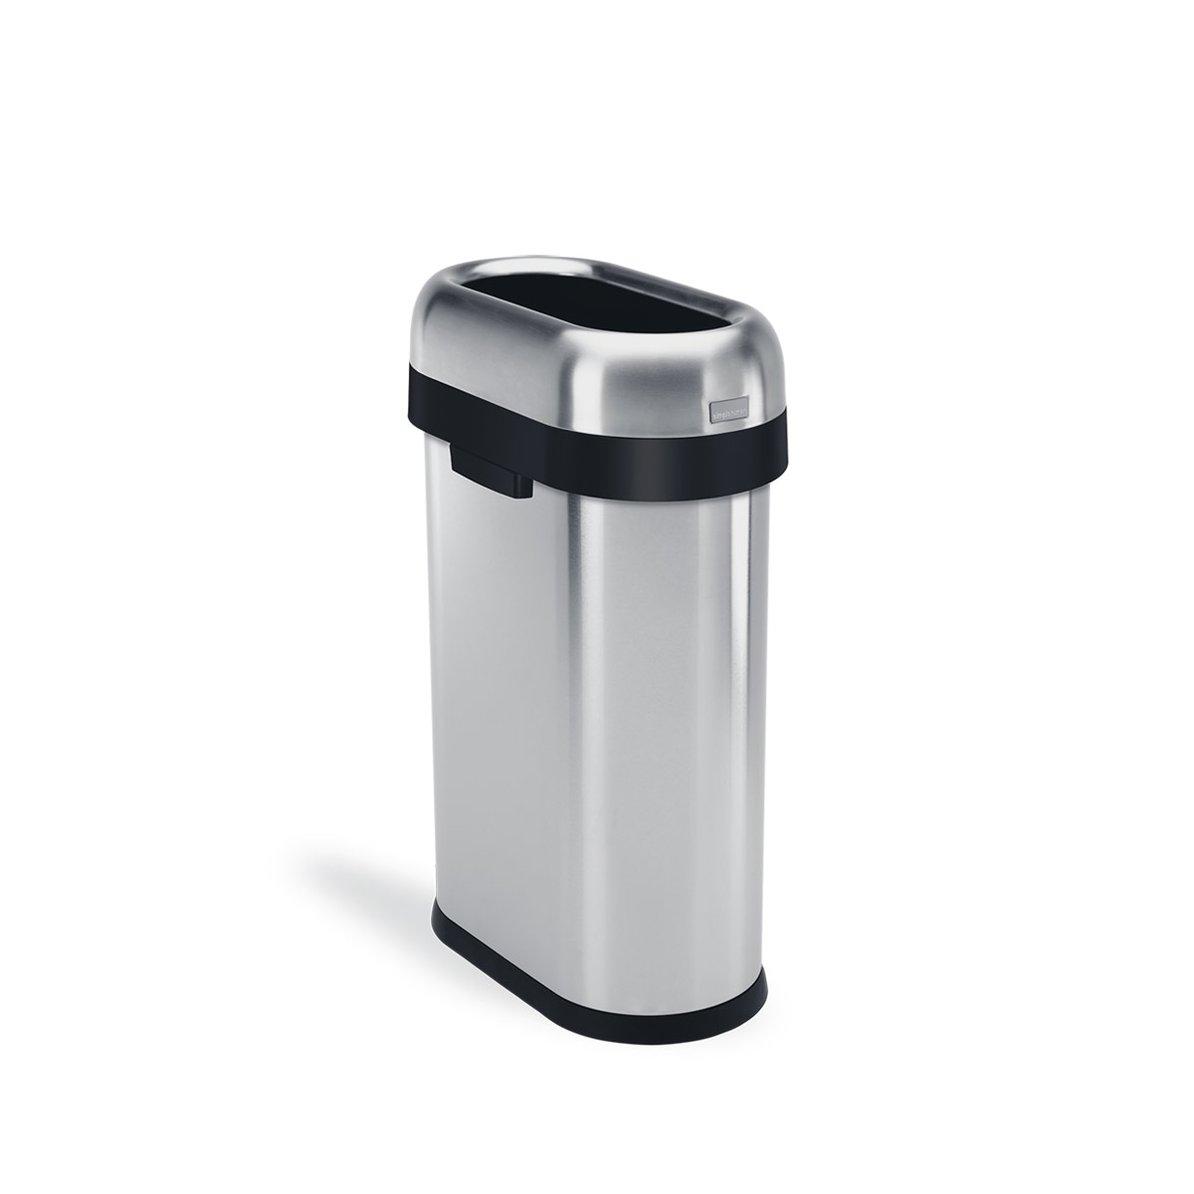 Simplehuman Slim 50L, roska-astia